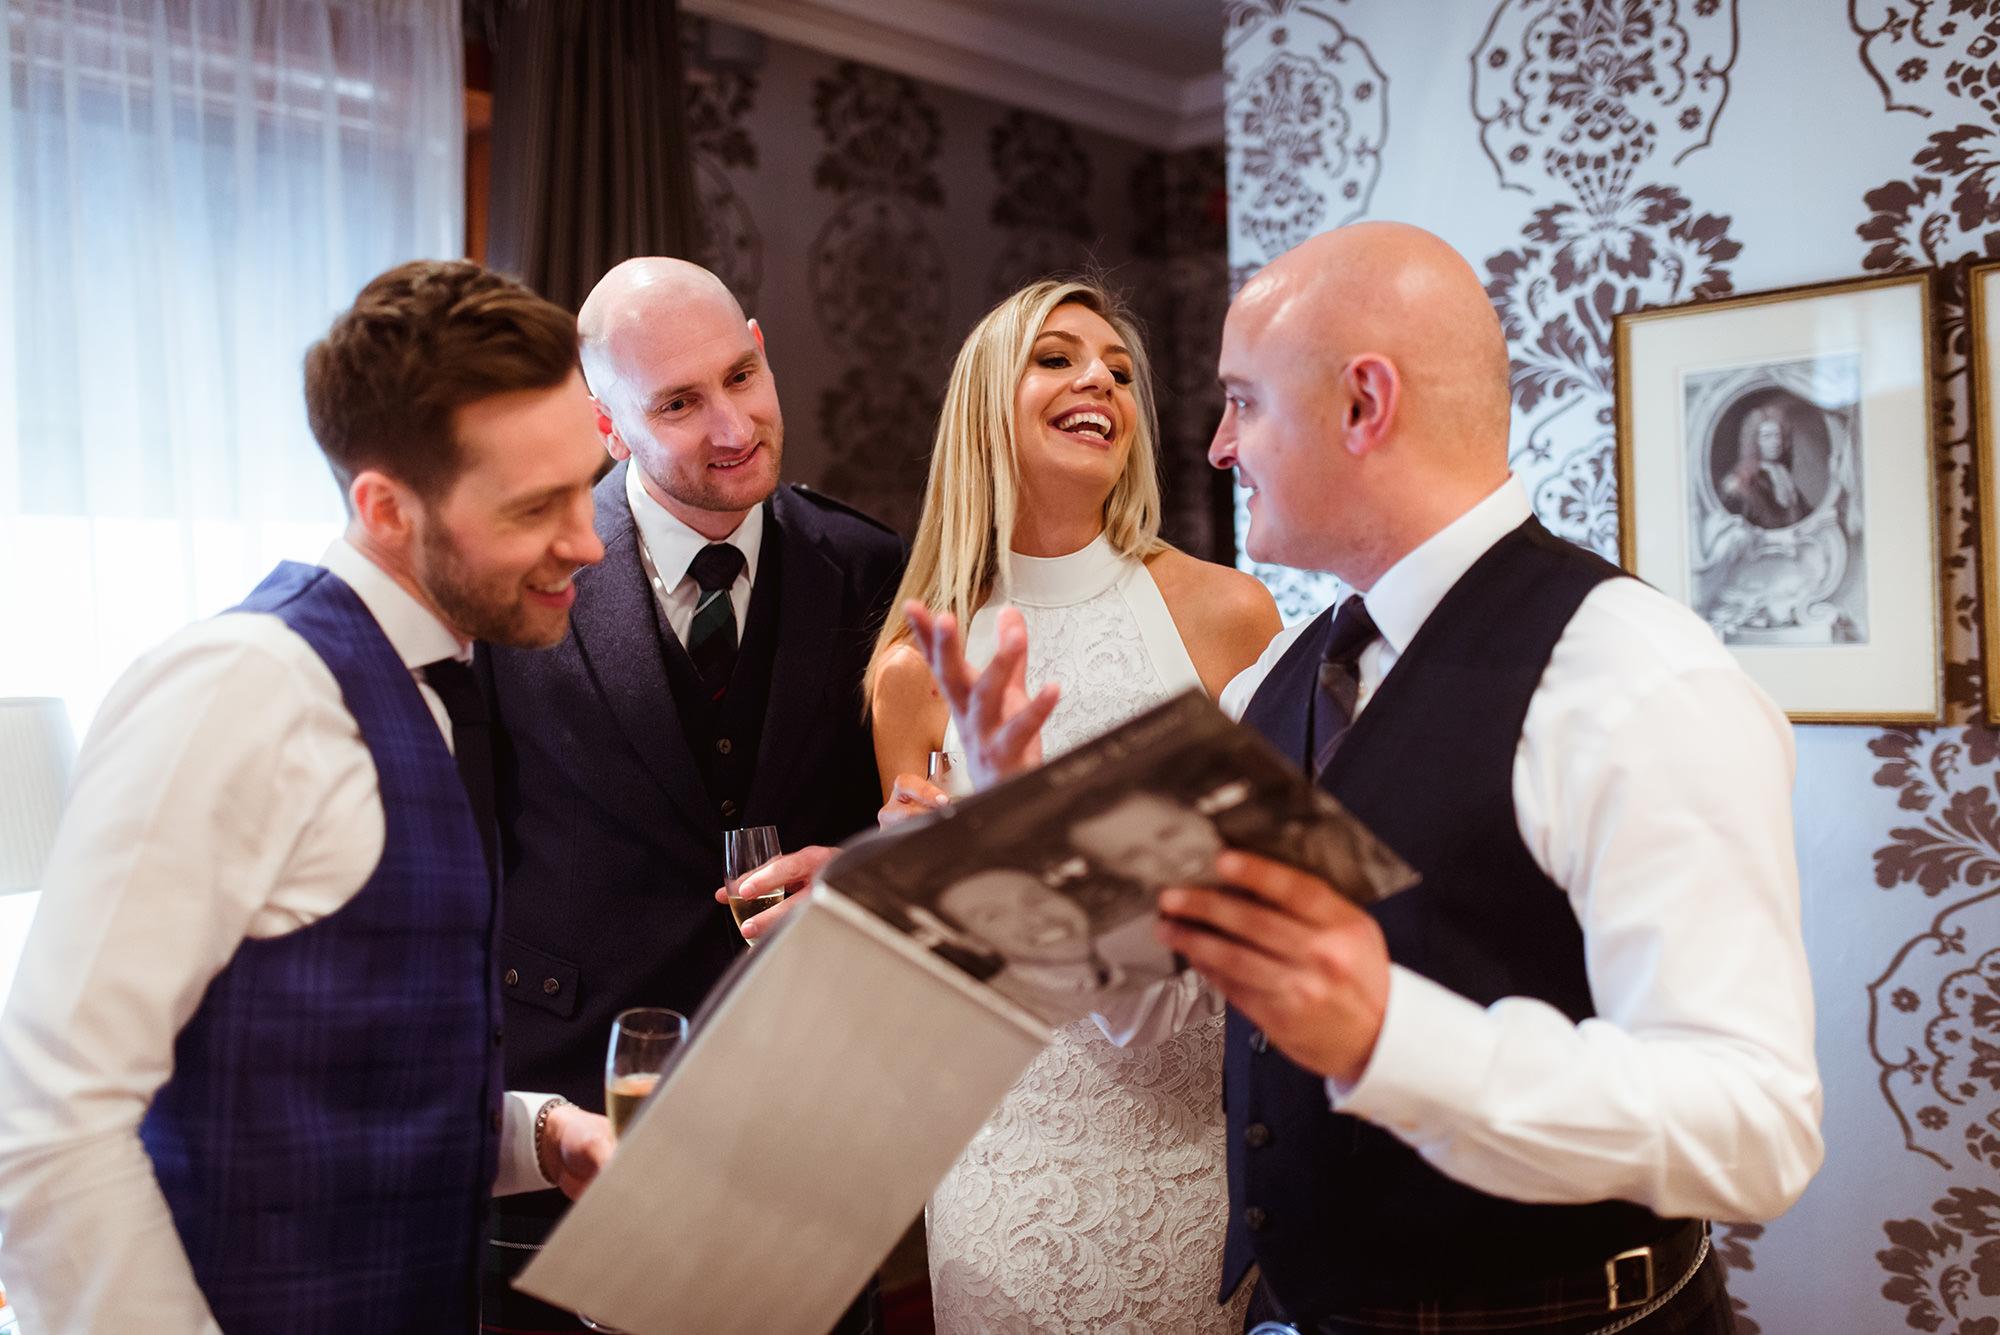 Hotel du vin wedding photo